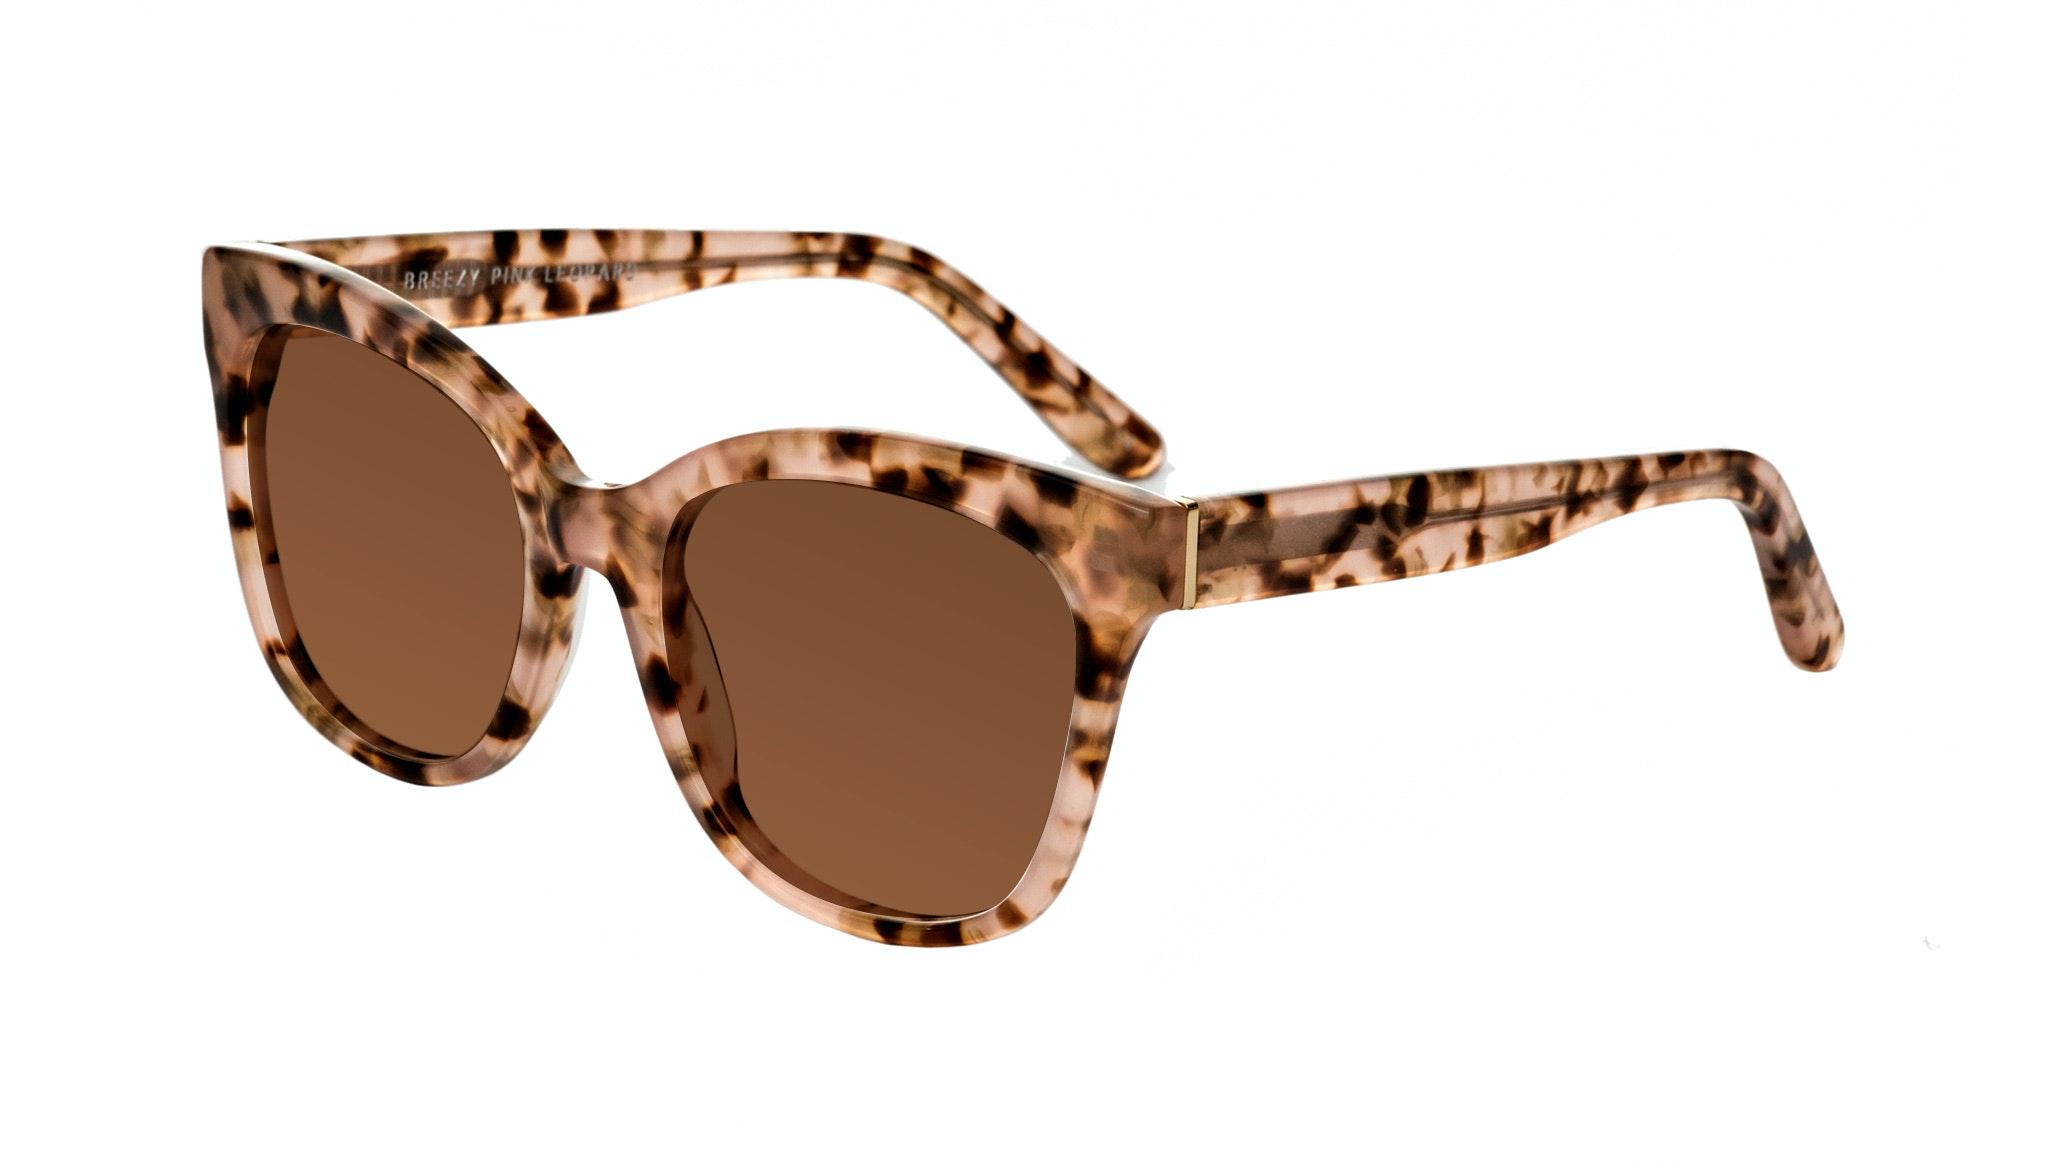 Affordable Fashion Glasses Square Sunglasses Women Breezy Pink Leopard Tilt